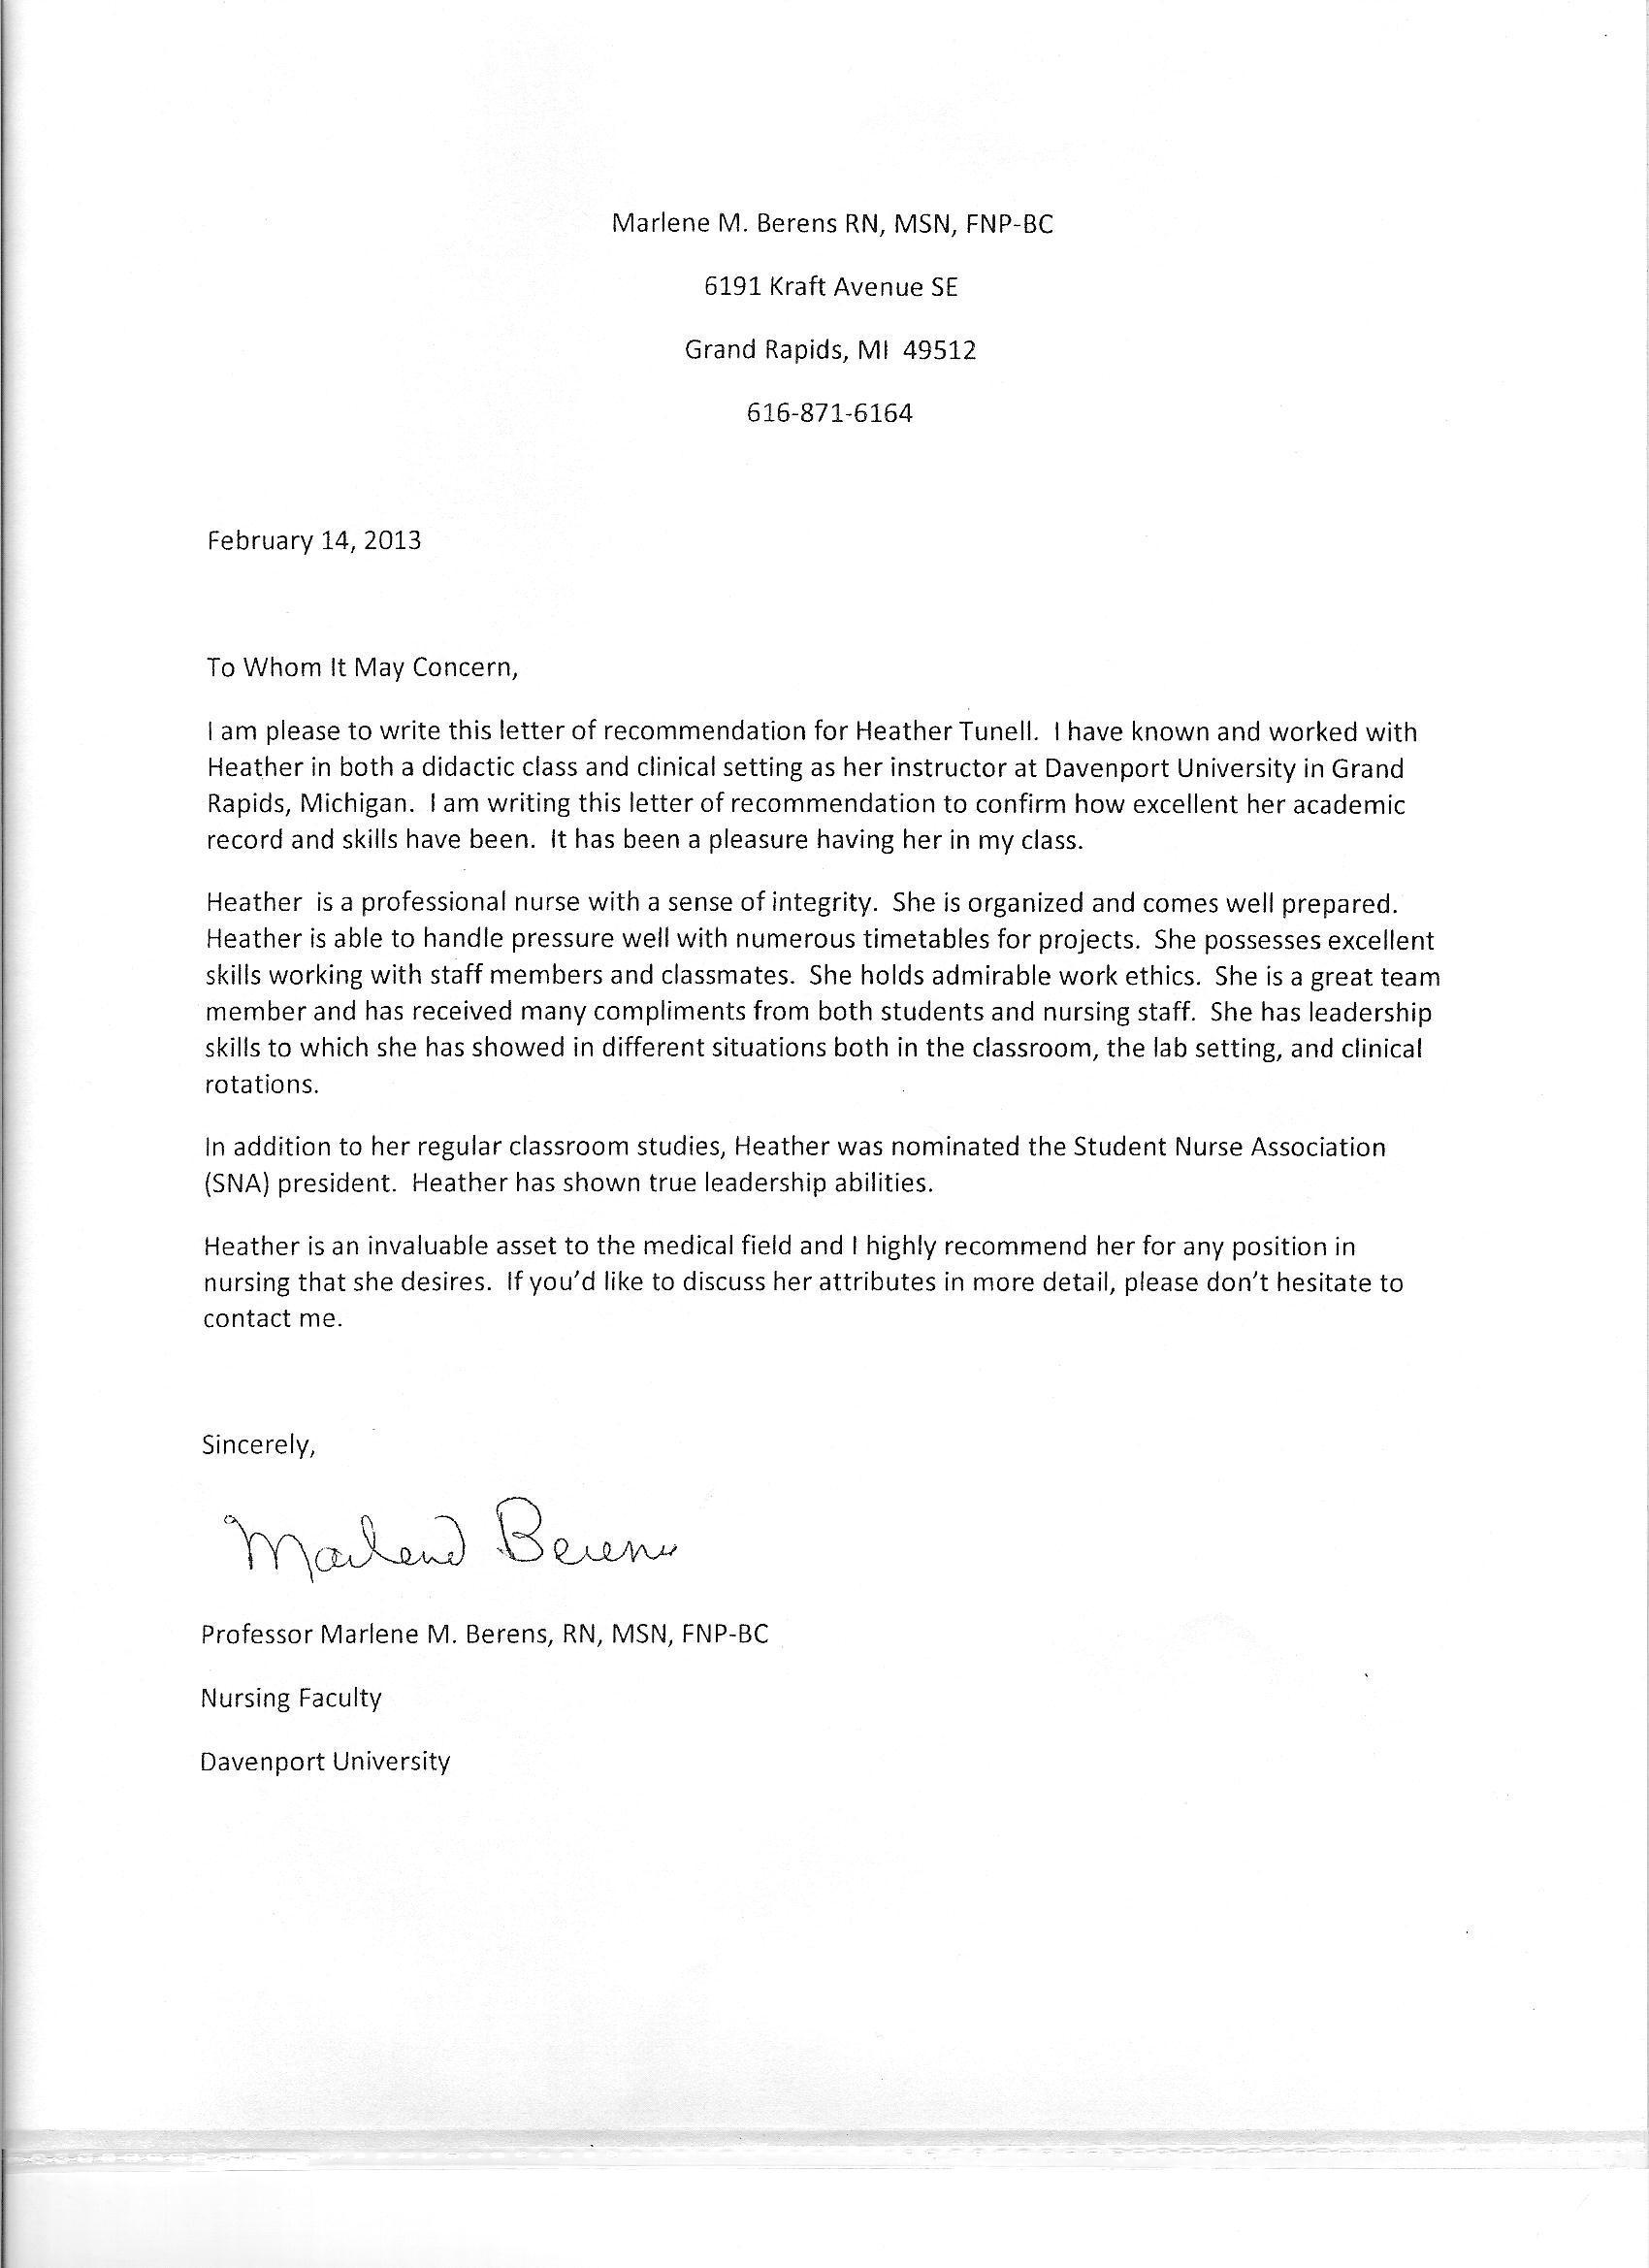 Recommendation Letter Nursing School Templates Free